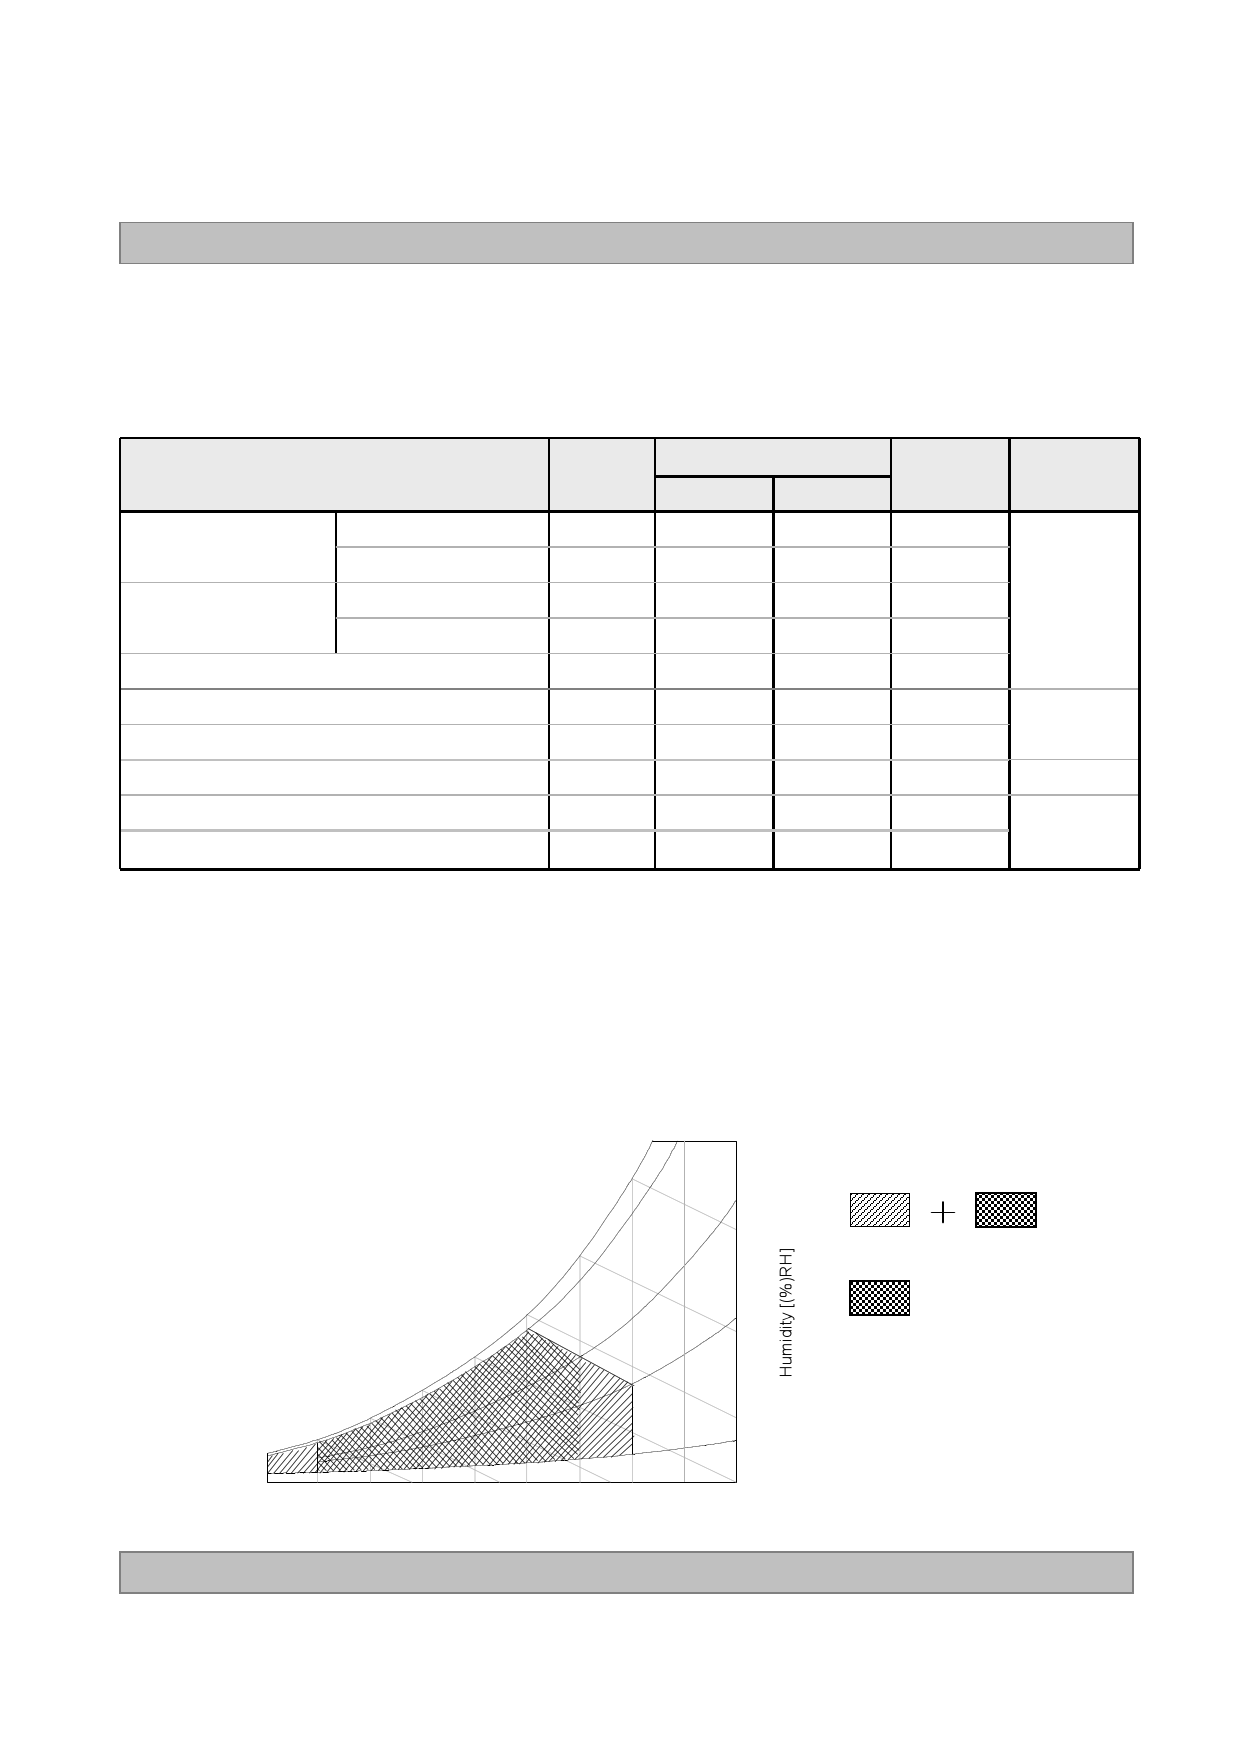 LC320EXN-SEA3 pdf